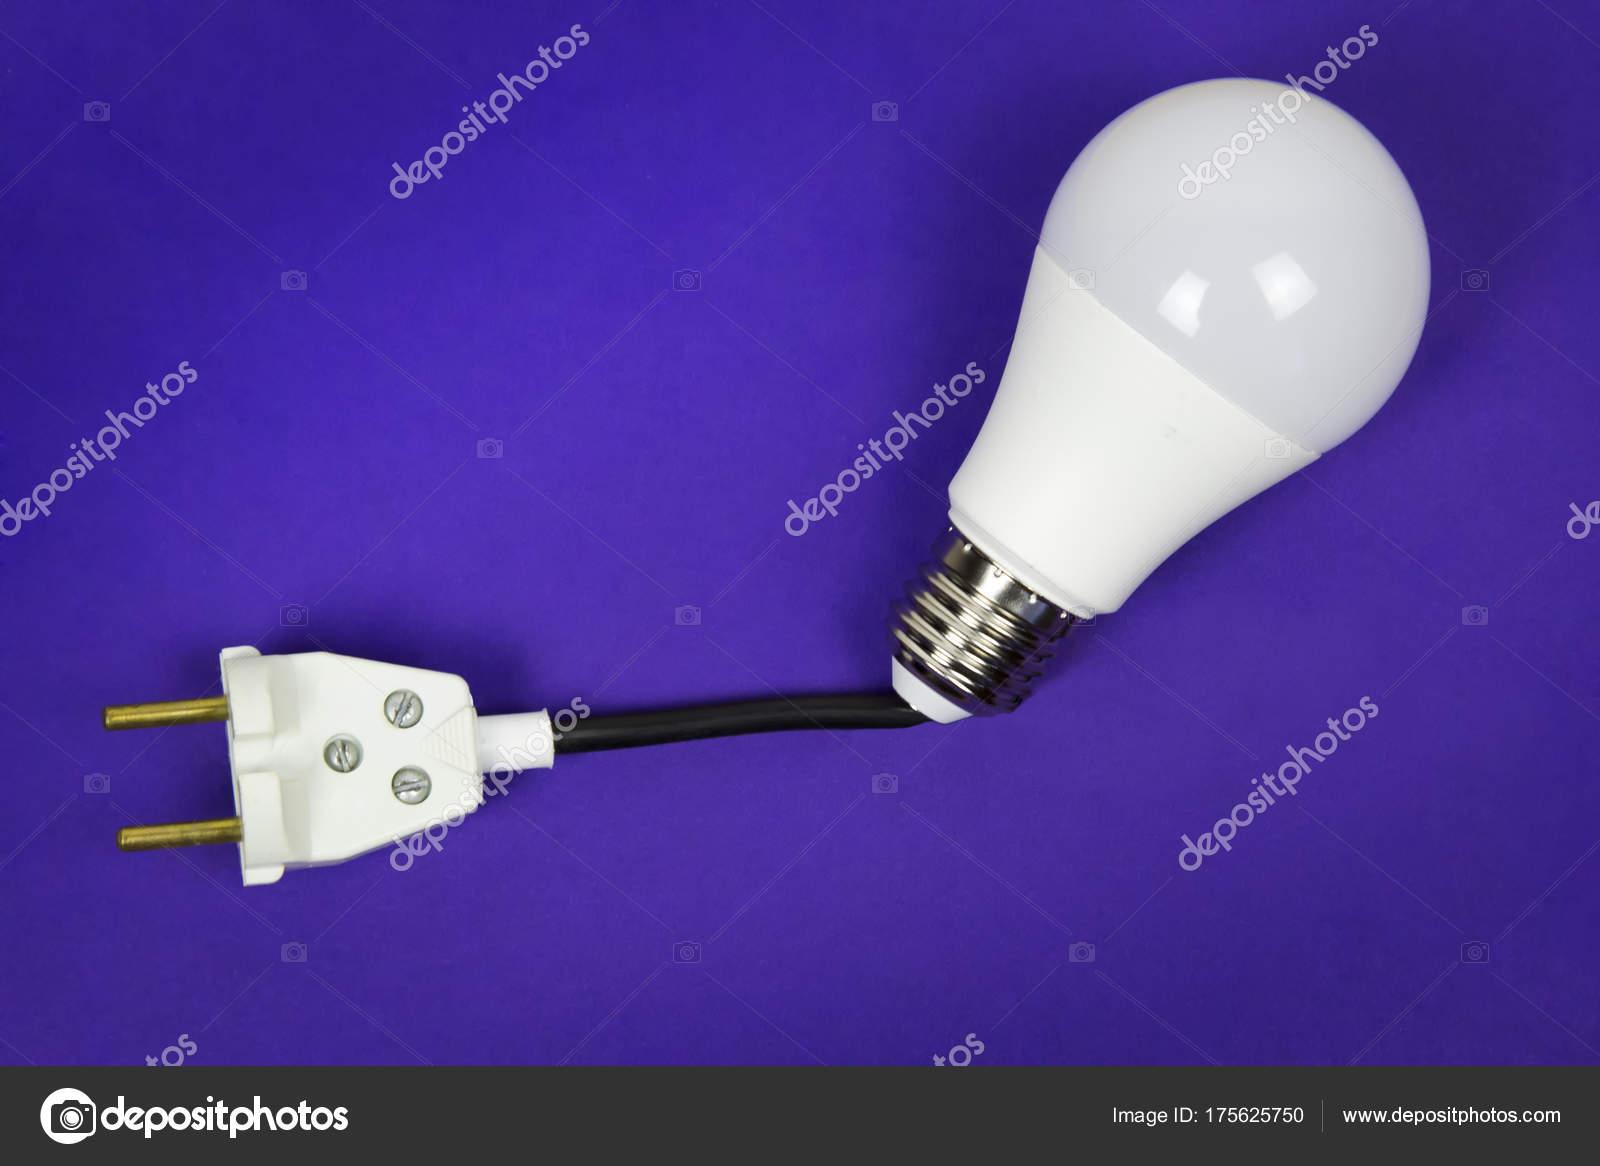 Lampe Led Avec Fil Photographie Futag Mail Ru C 175625750